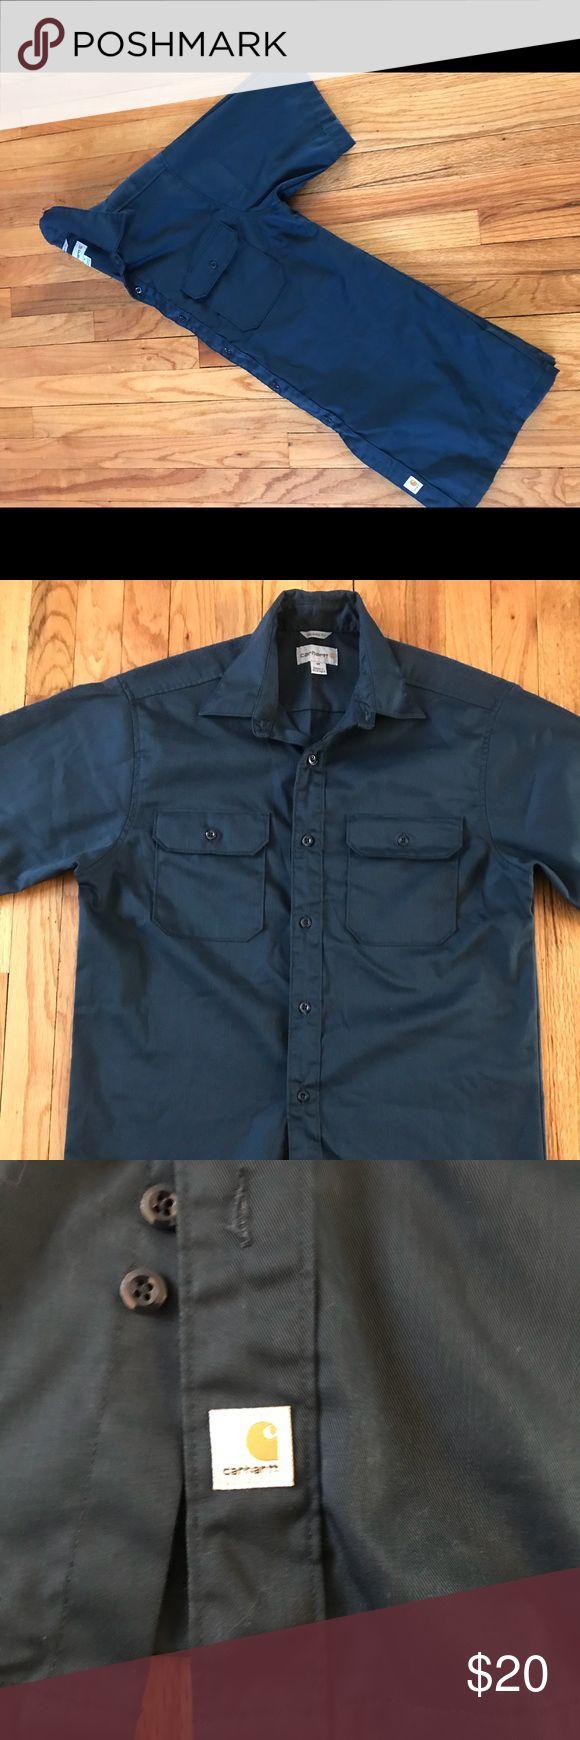 Carhartt M Short Slve Button Down Blue Work Shirt Carhartt M Short Slve Button Down Blue Work Shirt Carhartt Shirts Casual Button Down Shirts